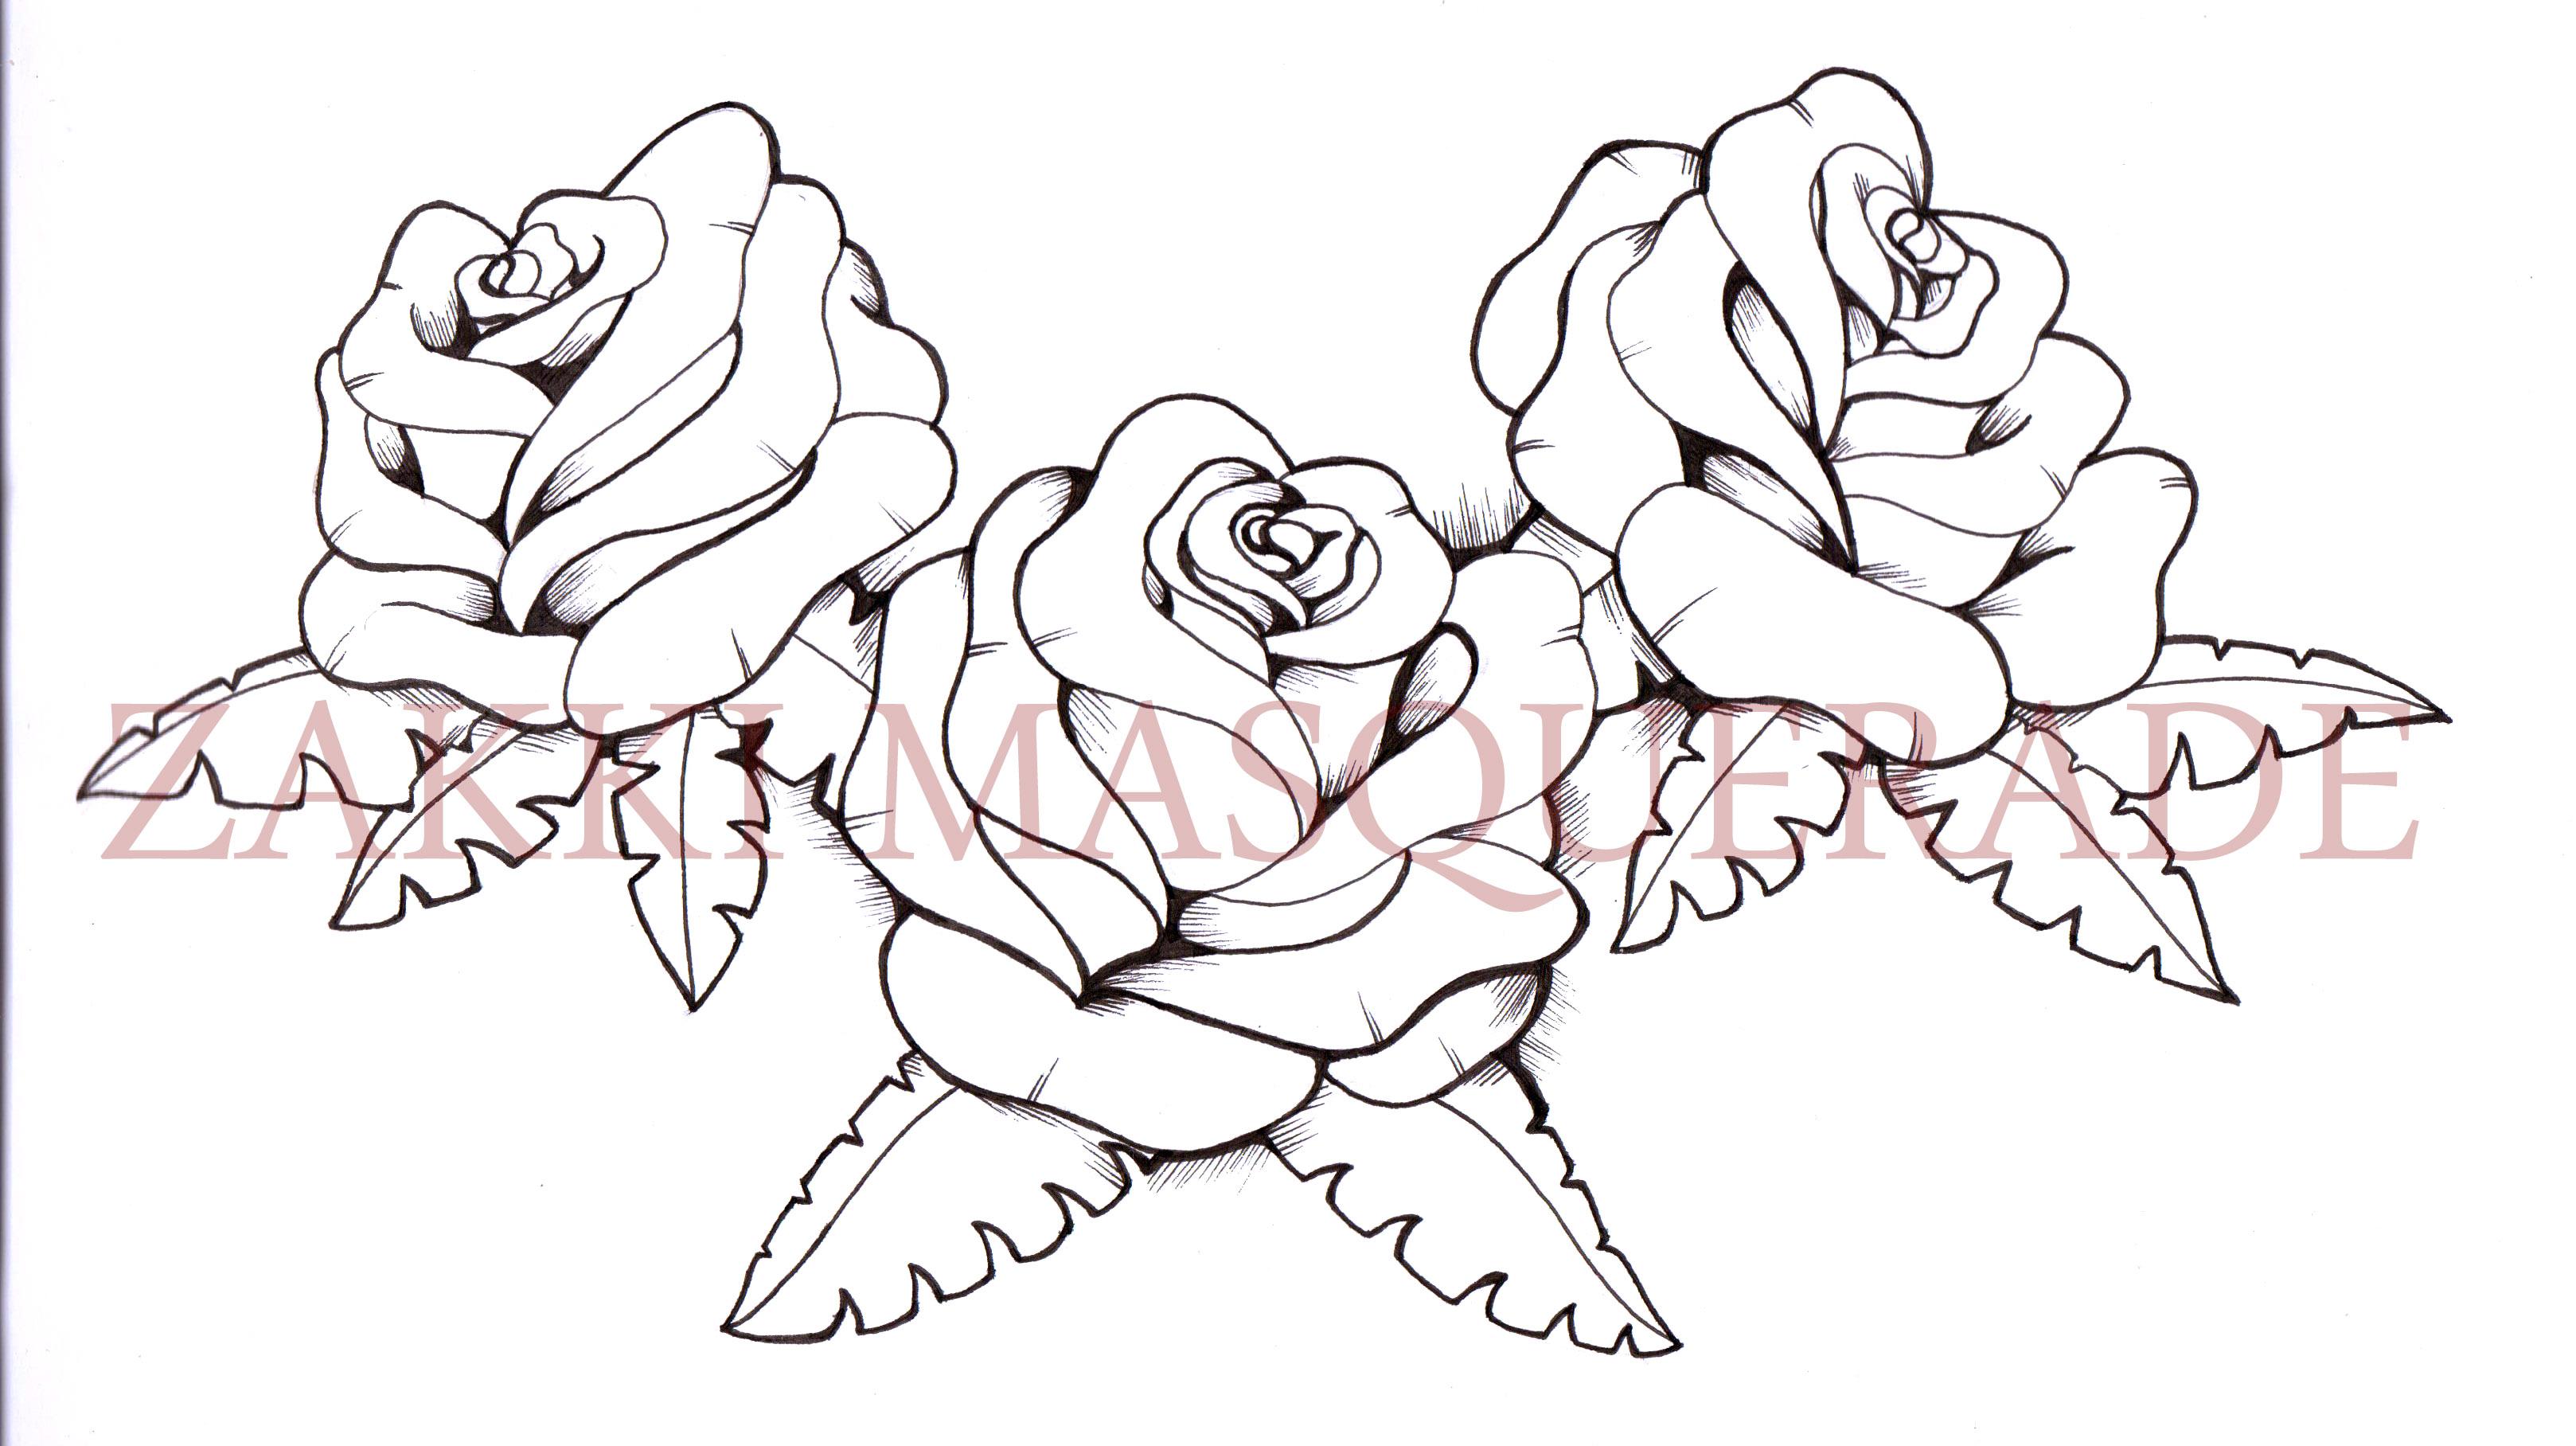 Drawn rose bush big rose Forum pieces pieces Tattoo Roses